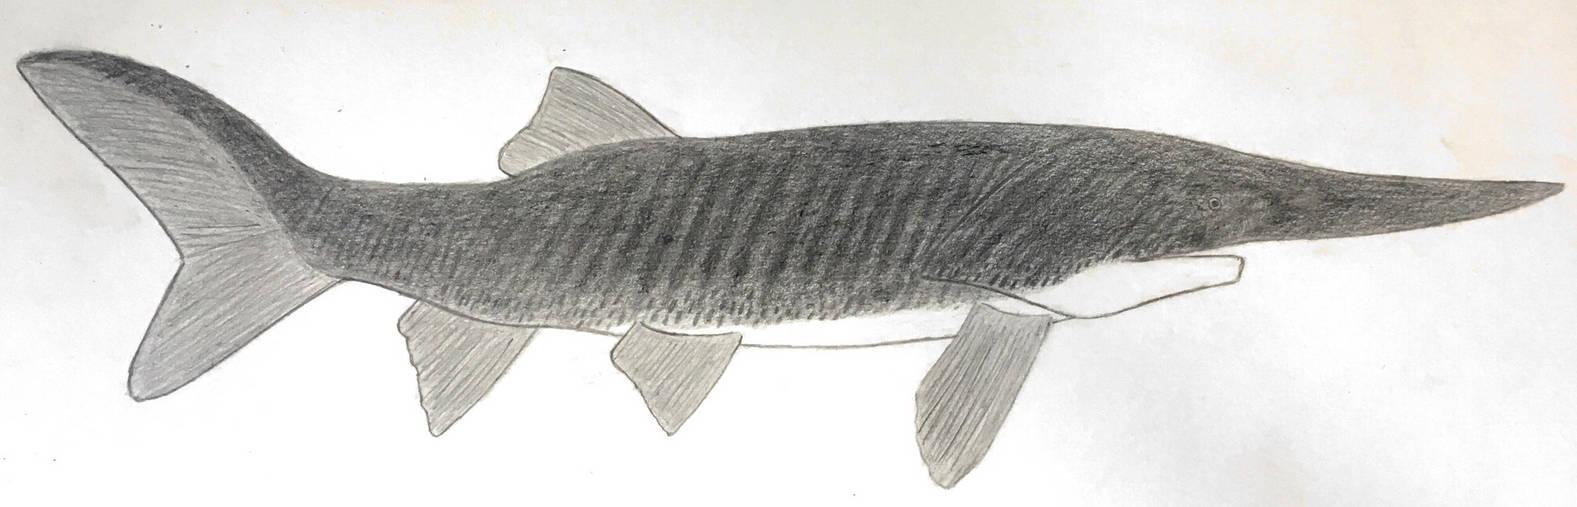 Paleopsephurus by Megalotitan